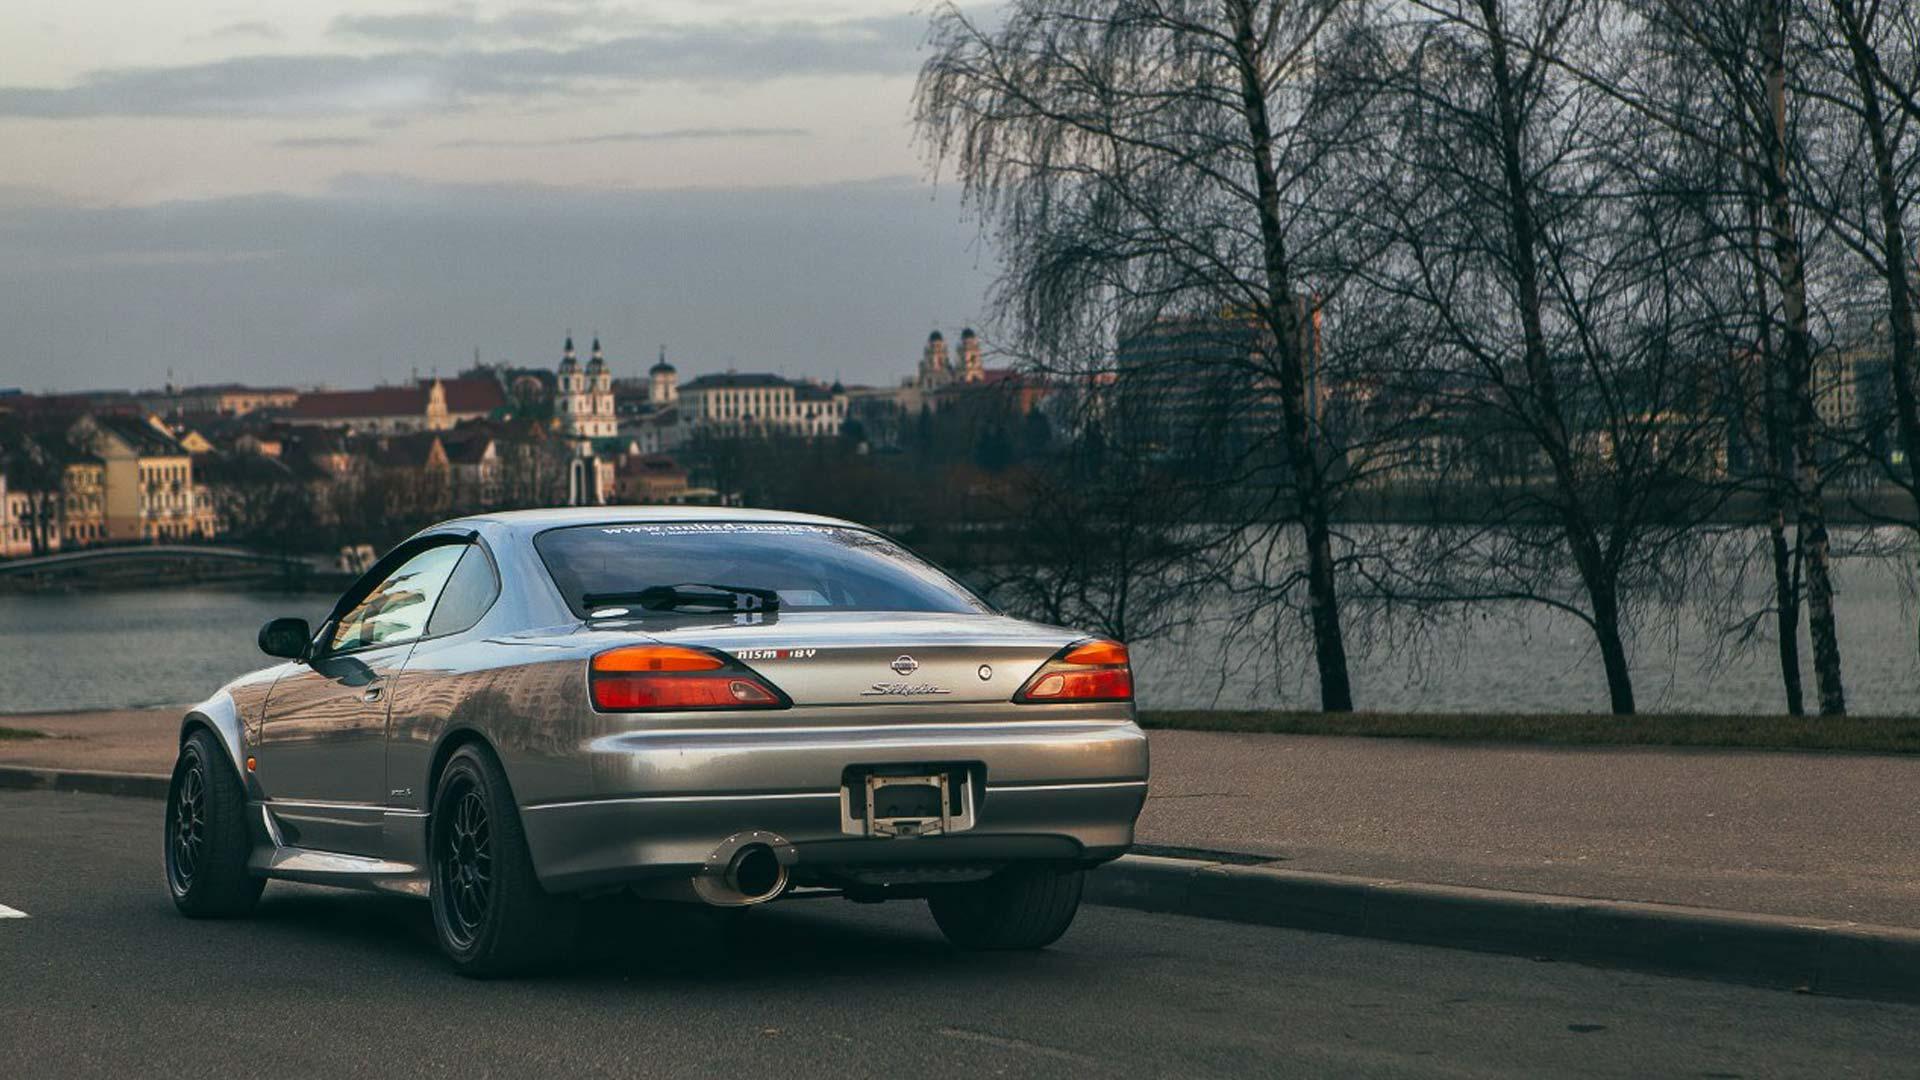 Nissan S15 Drift Limits Performance